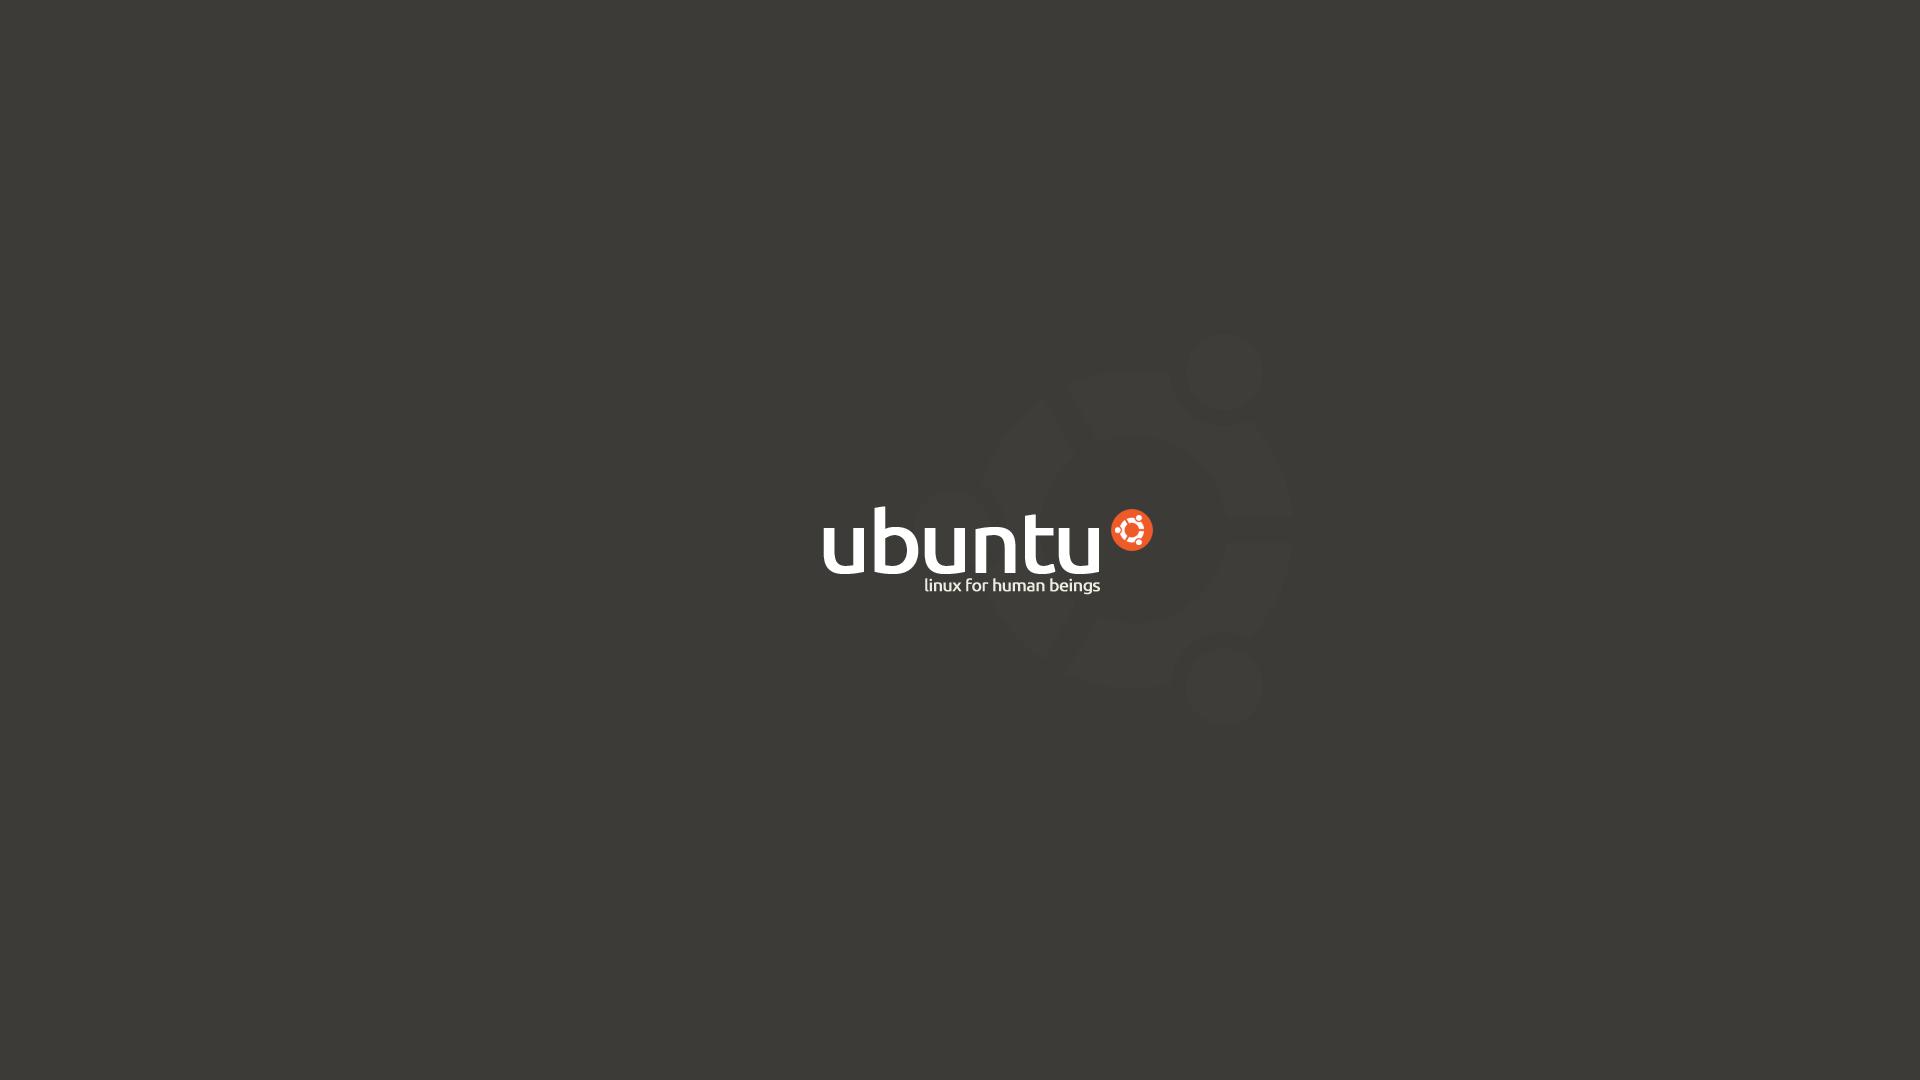 Ubuntu wallpaper by Mikebeecham - Tux-planet Ubuntu Wallpaper 1920x1080